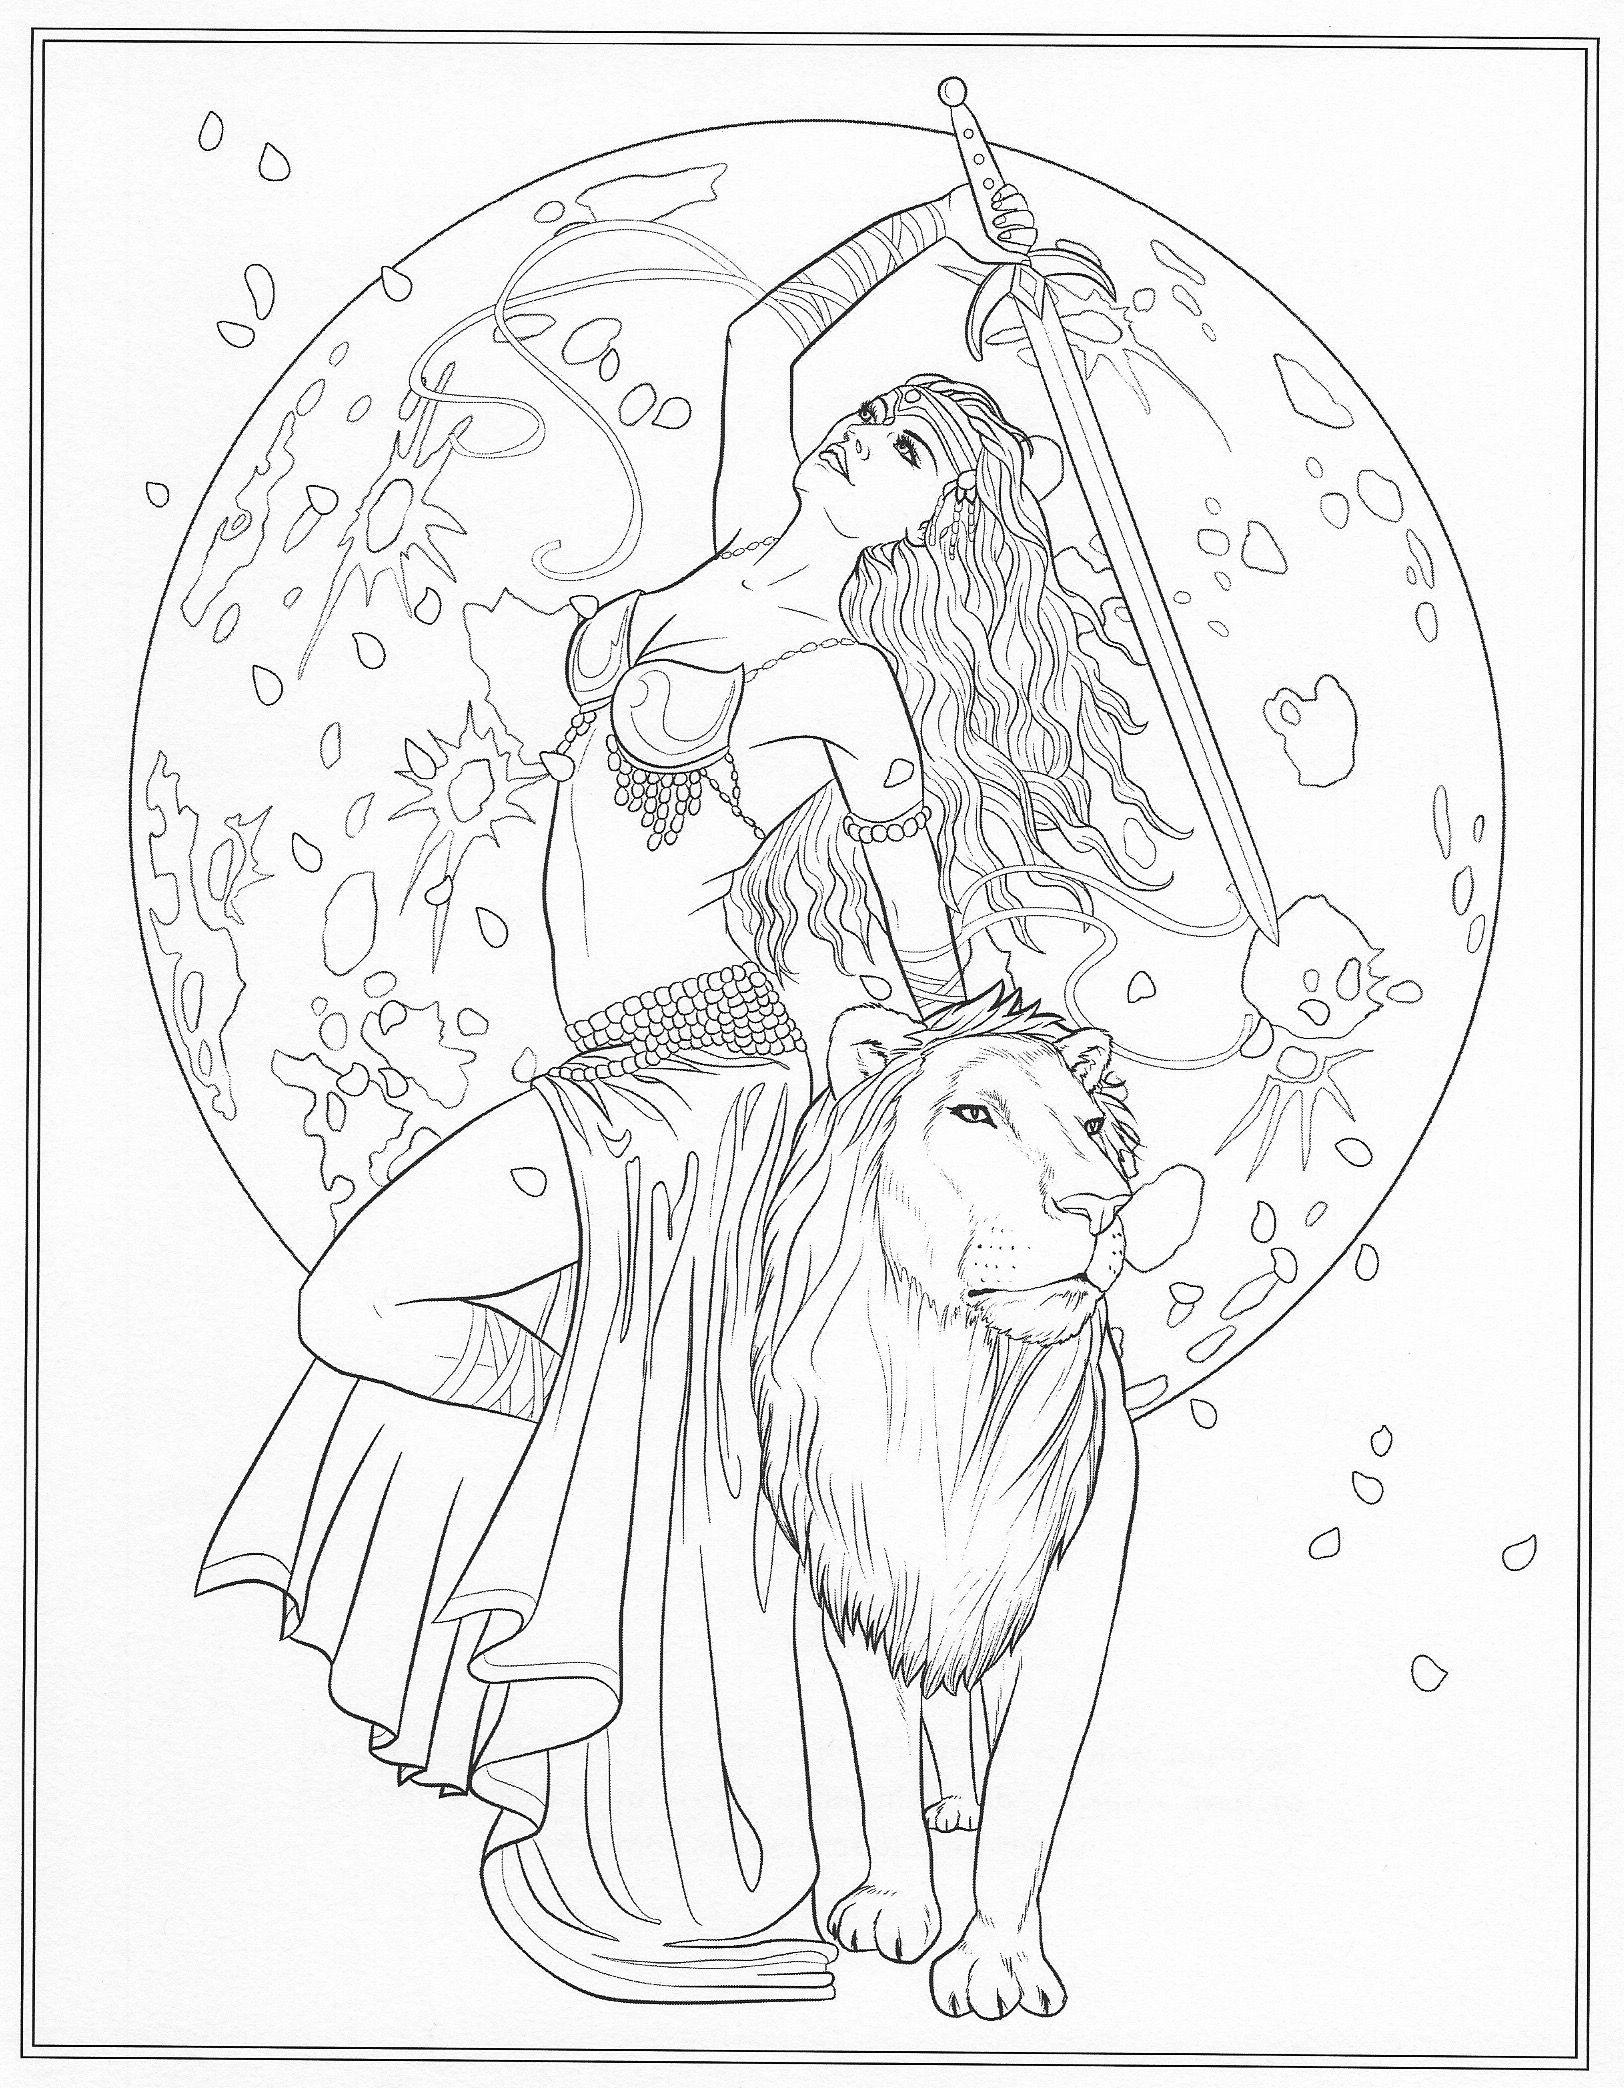 Pin de anna ekback en art | Pinterest | Mandalas, Colorear y Dibujo